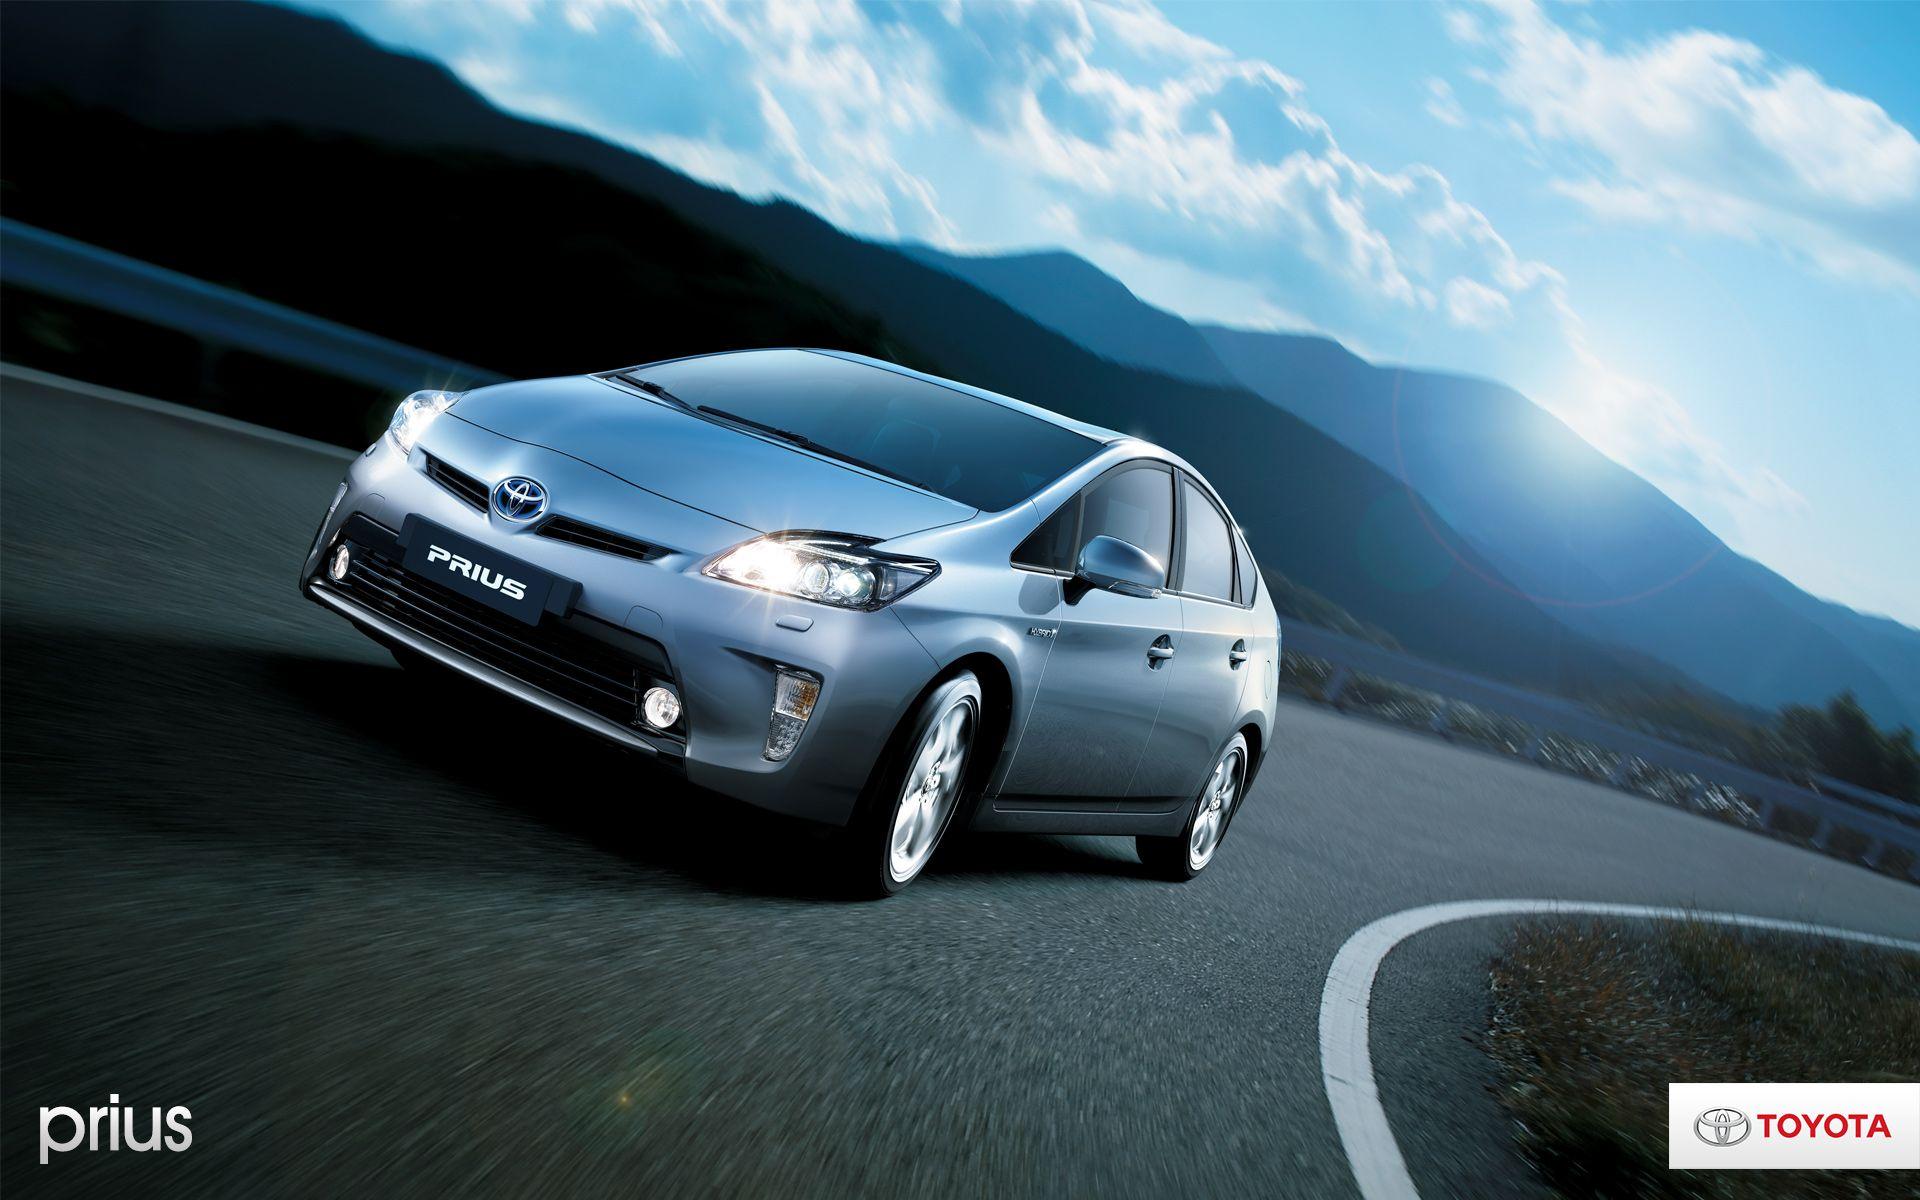 Toyota Prius Toyota Prius Toyota Cars Toyota Dealership